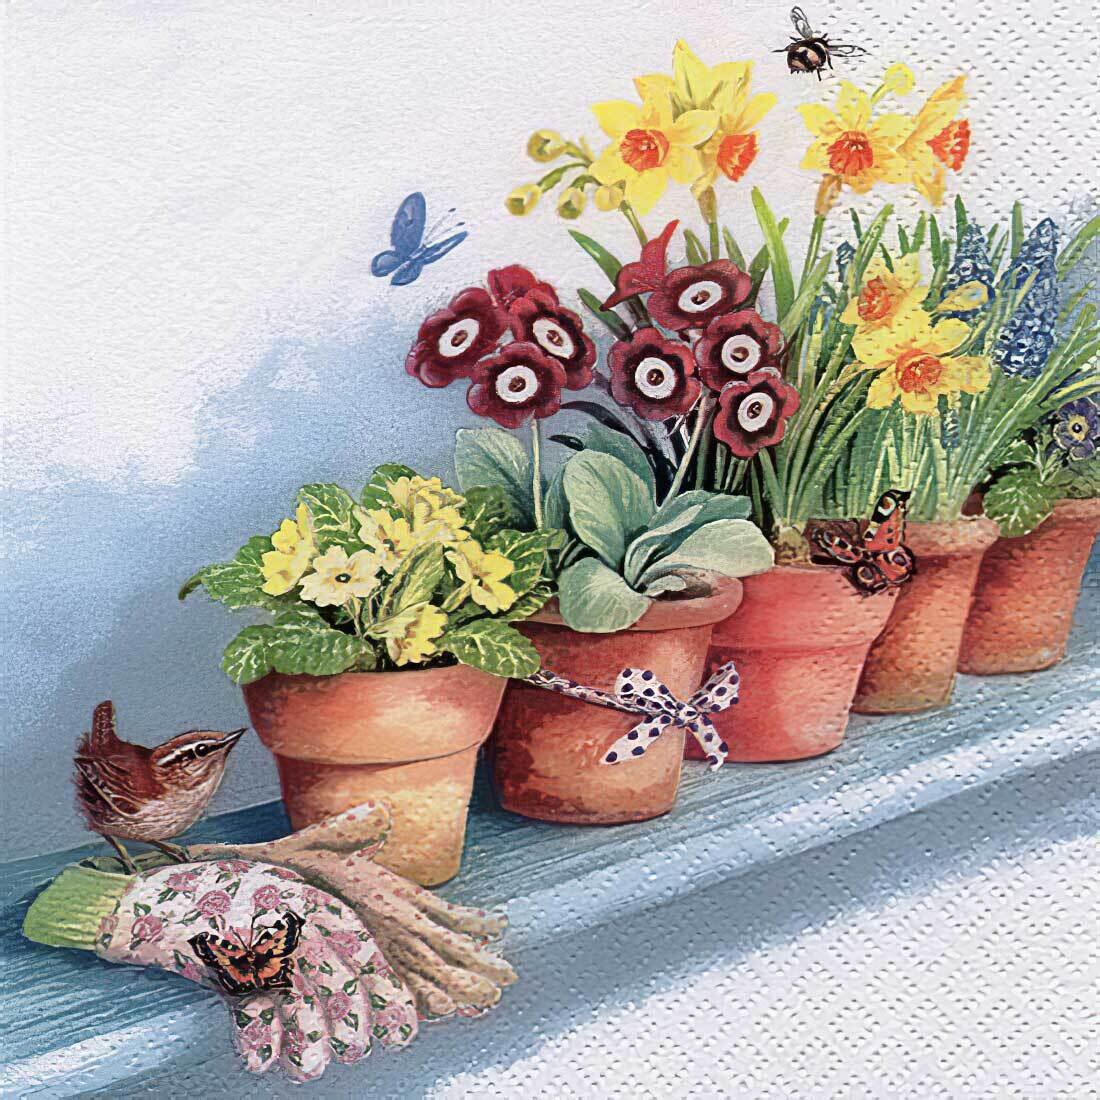 Decoupage Paper Napkins - Floral - Windowsill with Flower Pots  (1 Sheet)